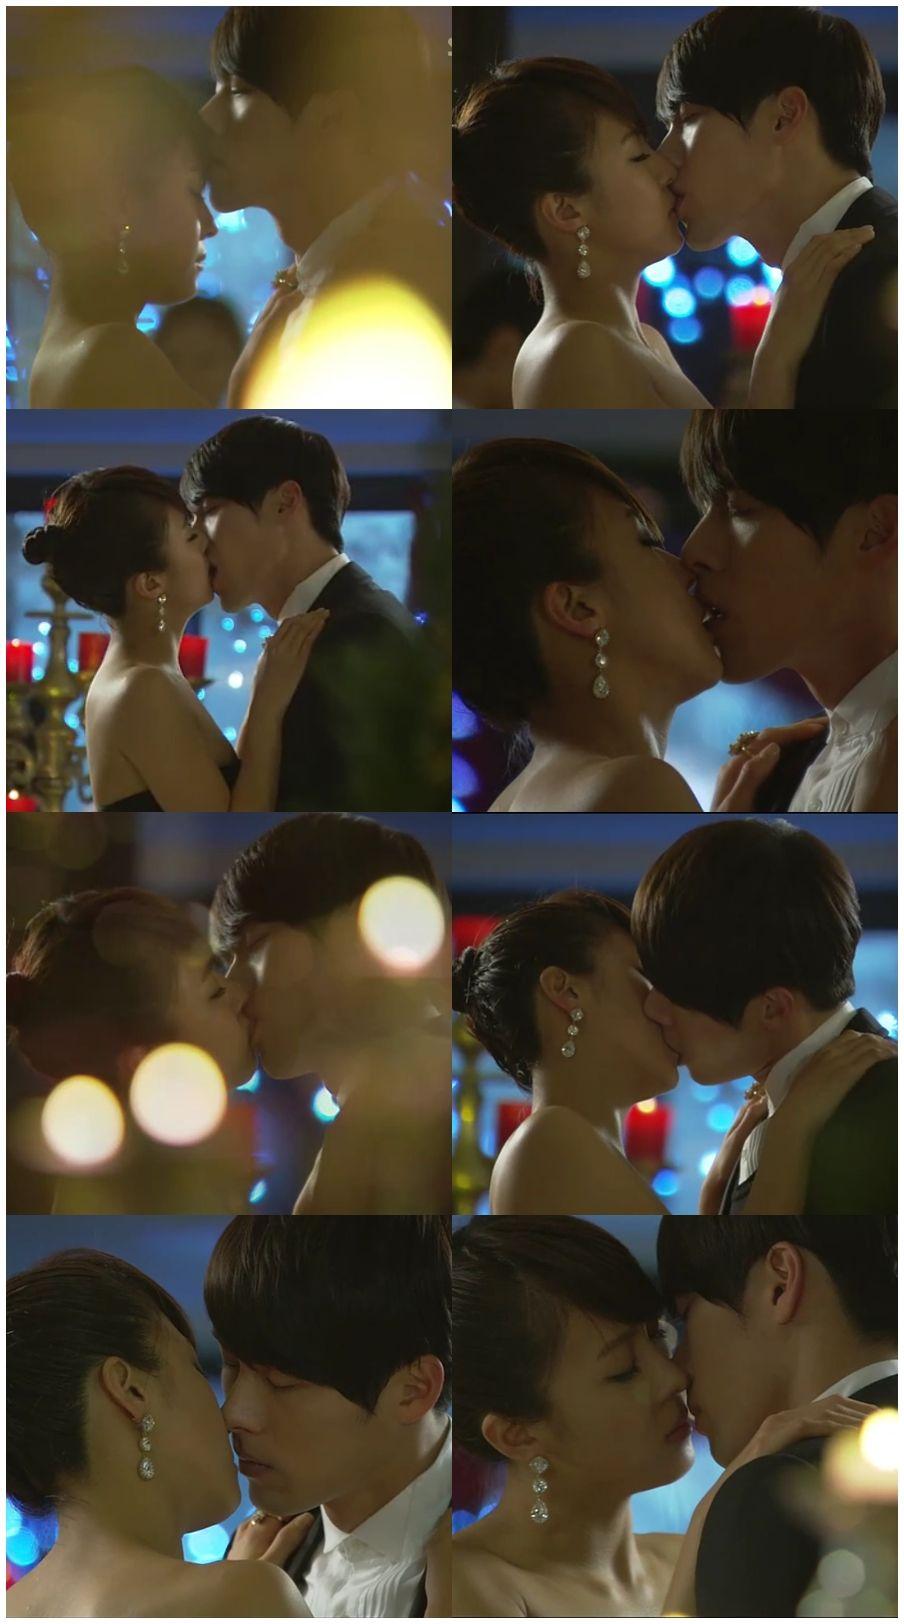 Secret garden.....wait a second. A drama with an ACTUAL kiss?! What ...